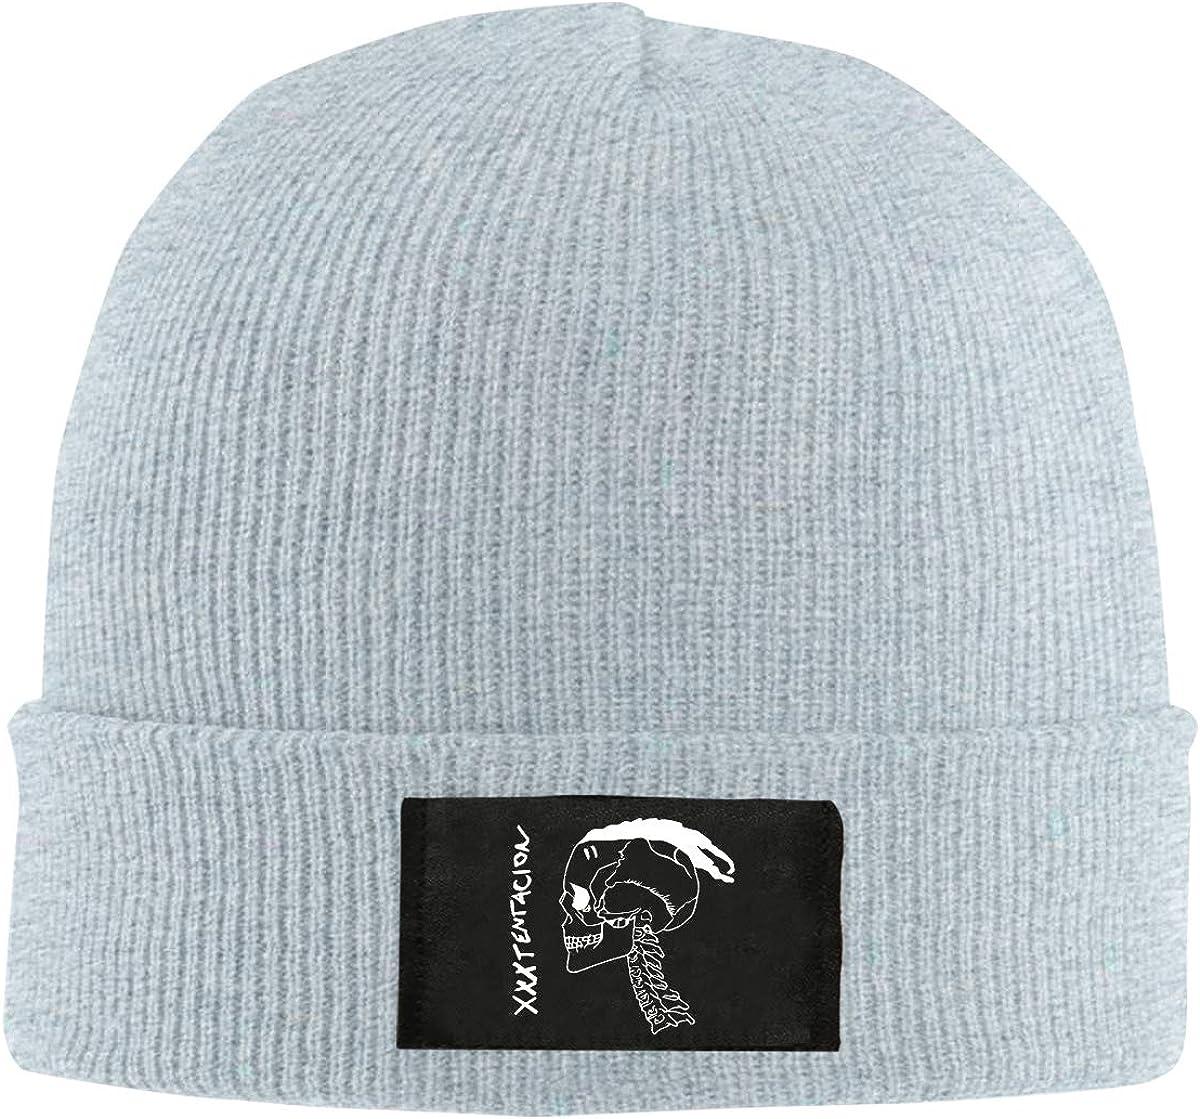 Xxxtentacion Remembering Knit Hat Soft Comfortable Warm Winter Beanie Print Cap for Men and Women 4 Colors